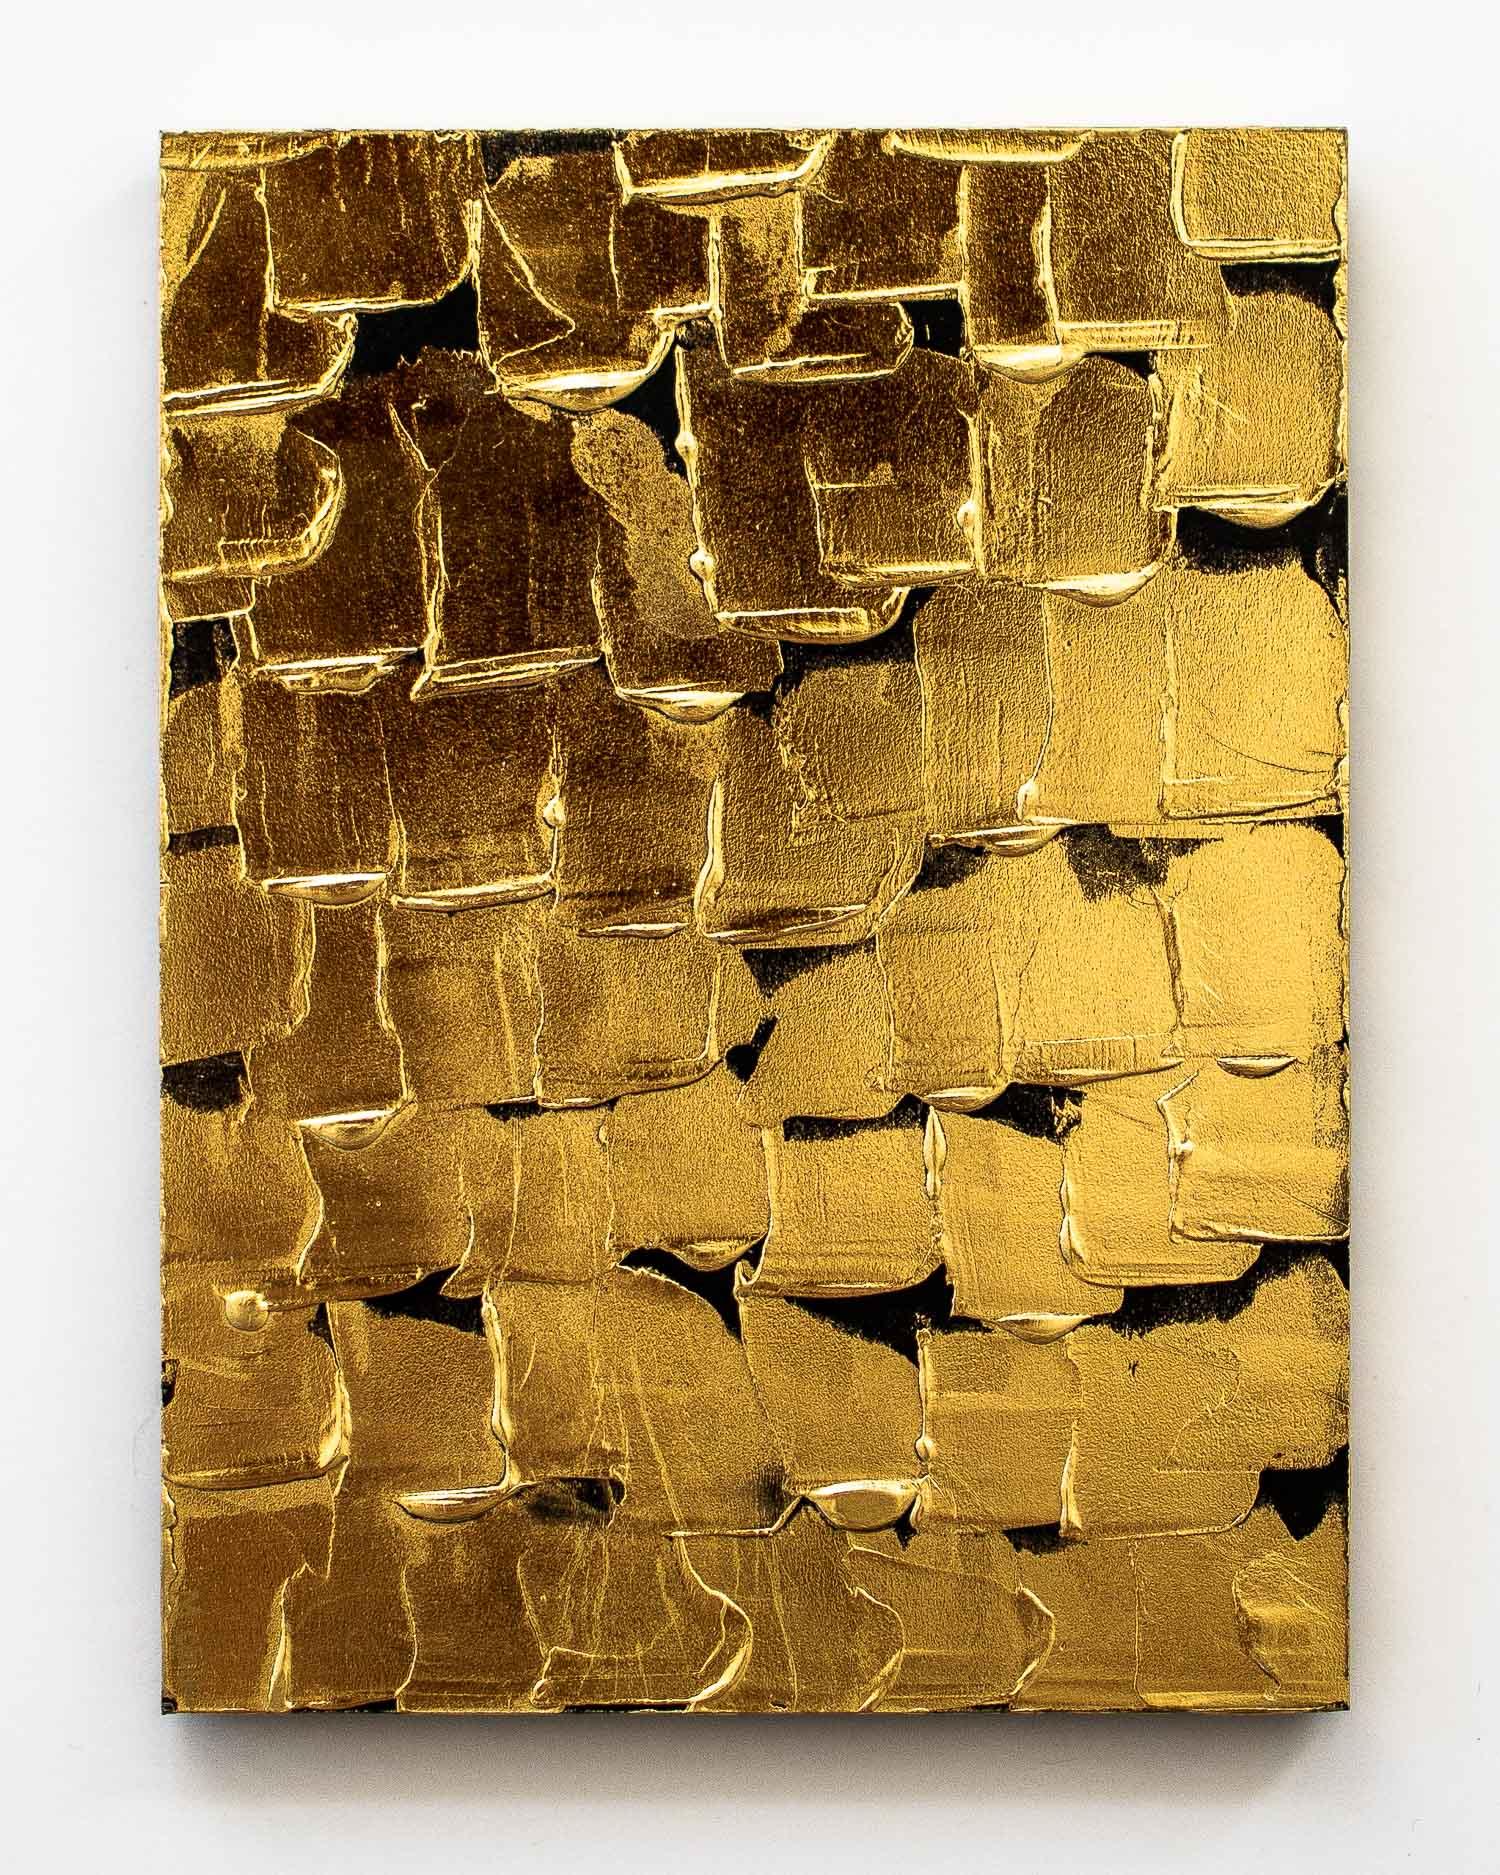 mclark_artwork_web_sold-5.jpg